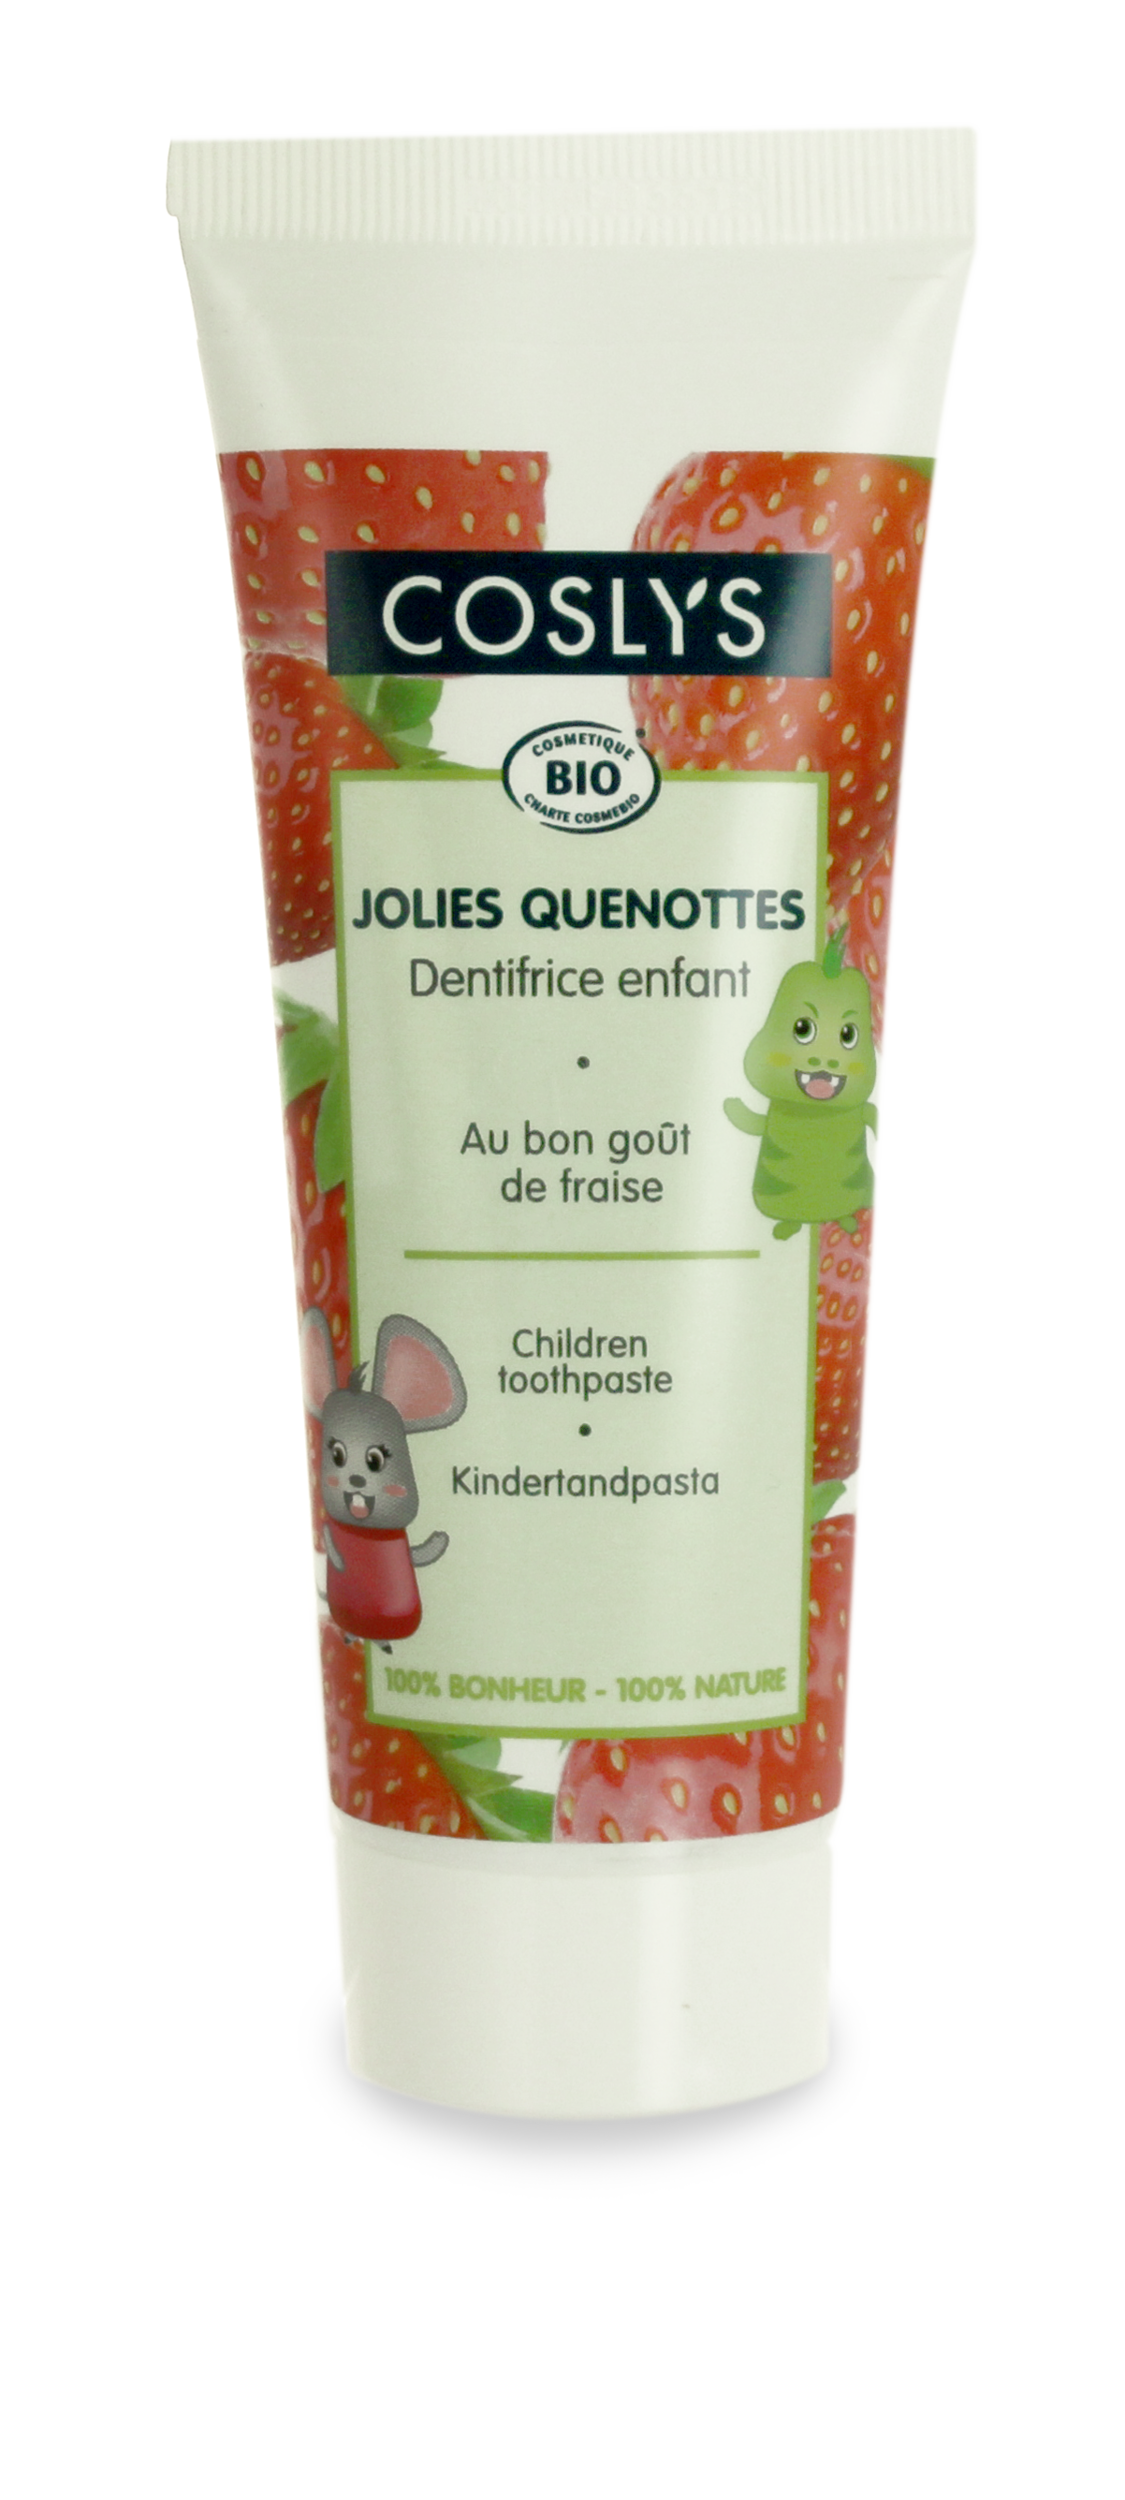 Coslys - Jolies quenottes -dentifrice enfant-75ml